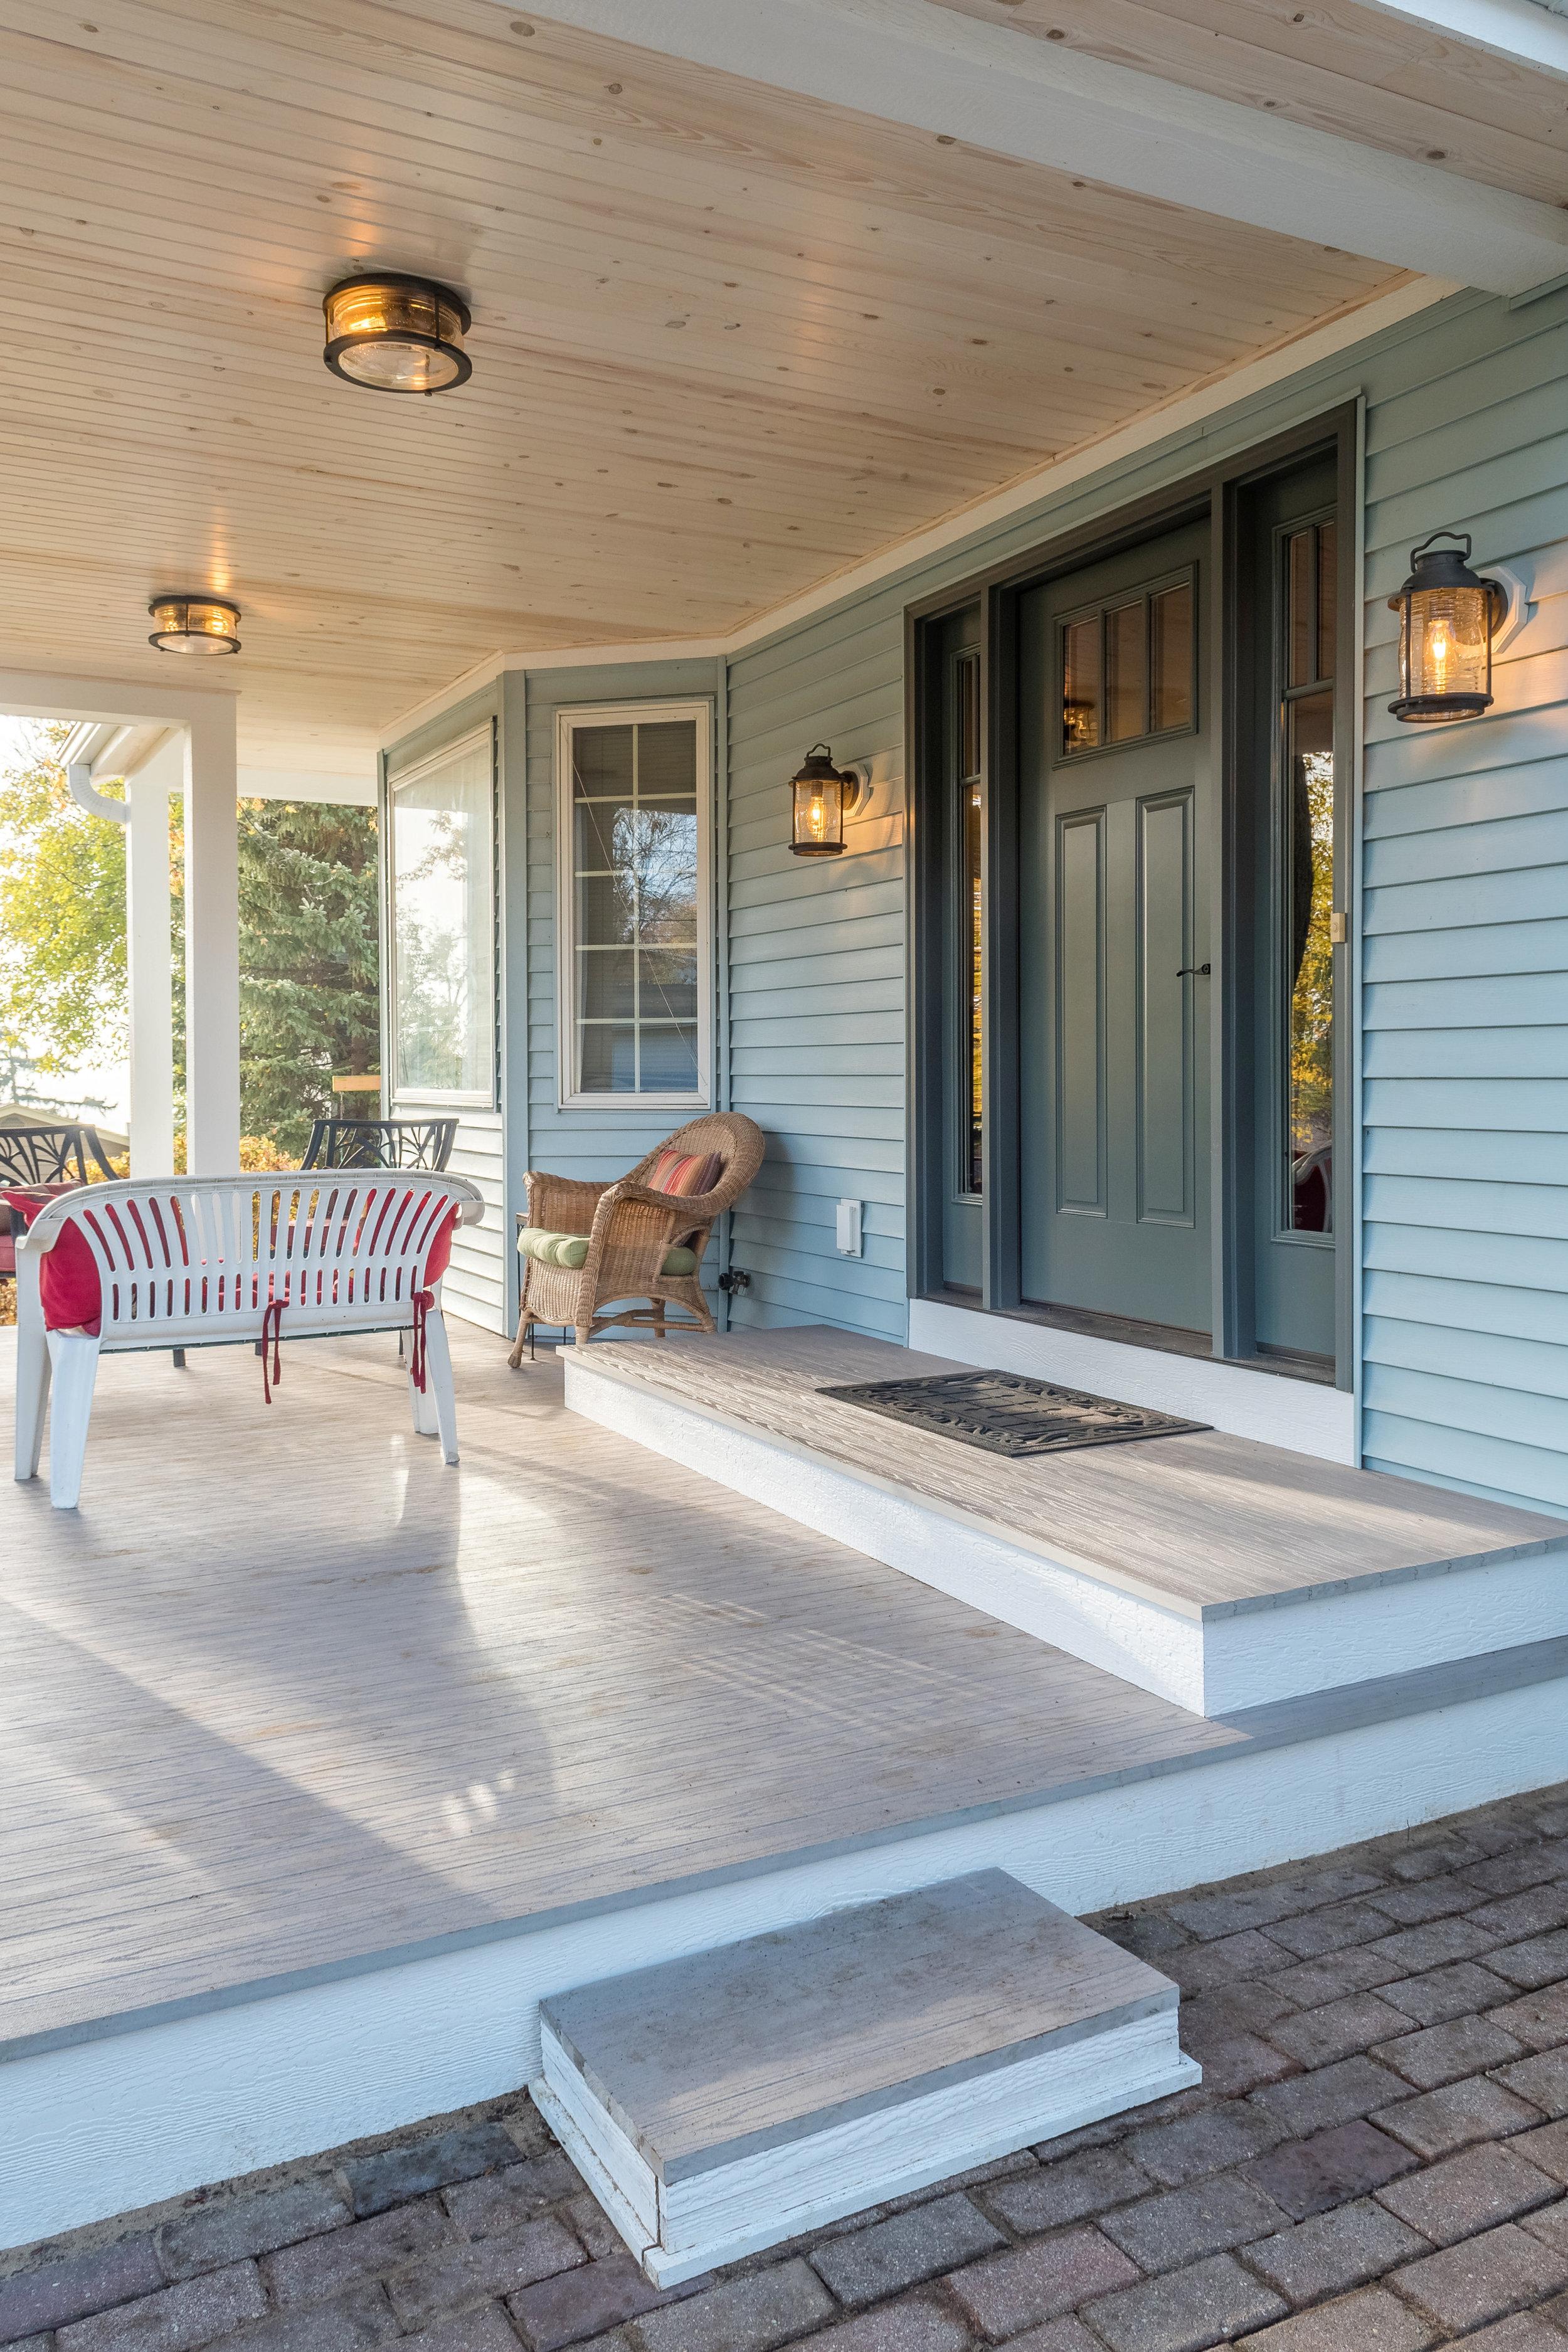 Porch Design Build - Architectural Photography